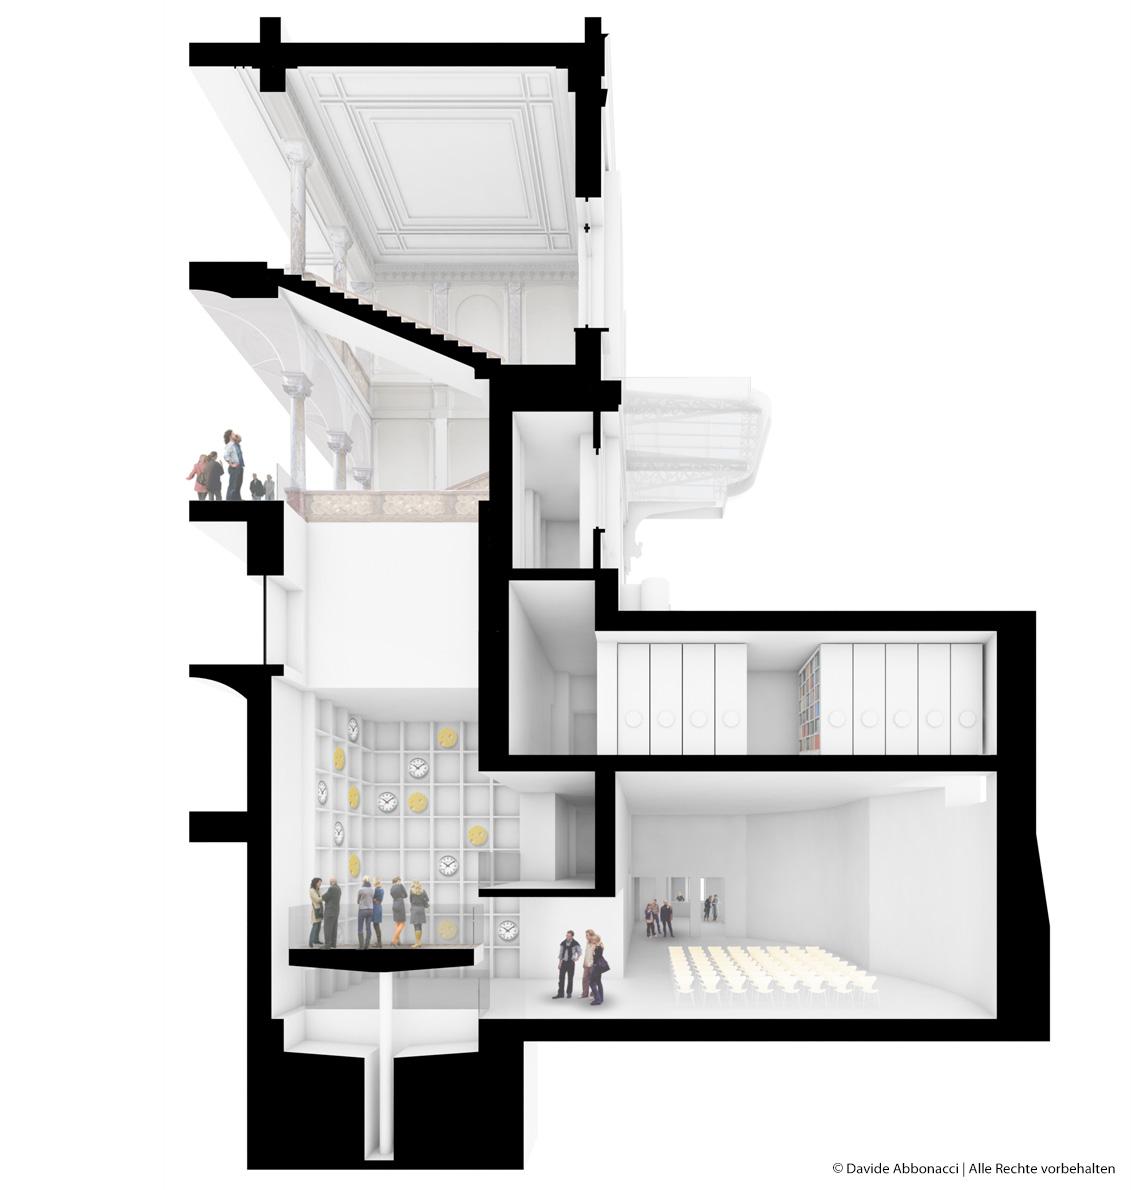 Villa Maraini, Rom, Italien | Kuehn Malvezzi Architekten | 2013 Wettbewerbsvisualisierung